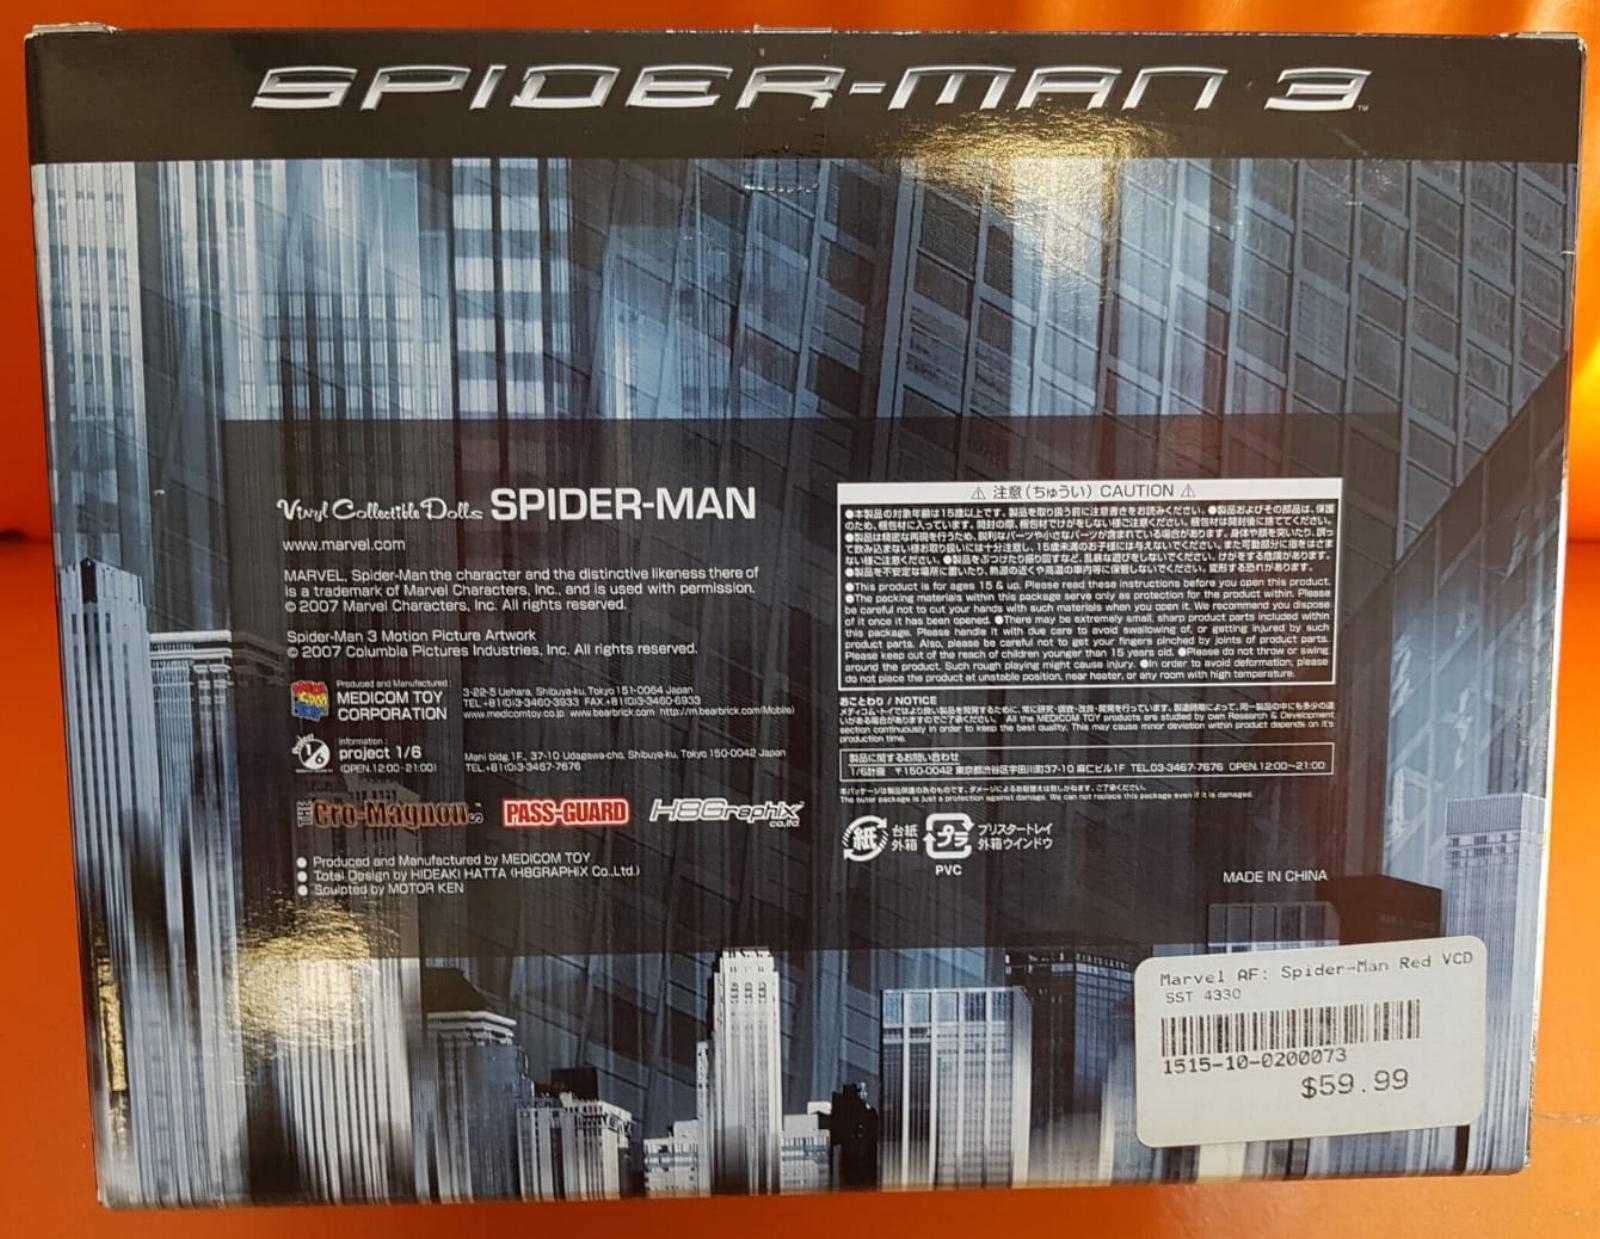 SPIDER MAN 3 rot VINYL COLLECTIBLE FIGURE MEDICOM MEDICOM MEDICOM TOY MARVEL COMICS DOLL NUOVO dabf67